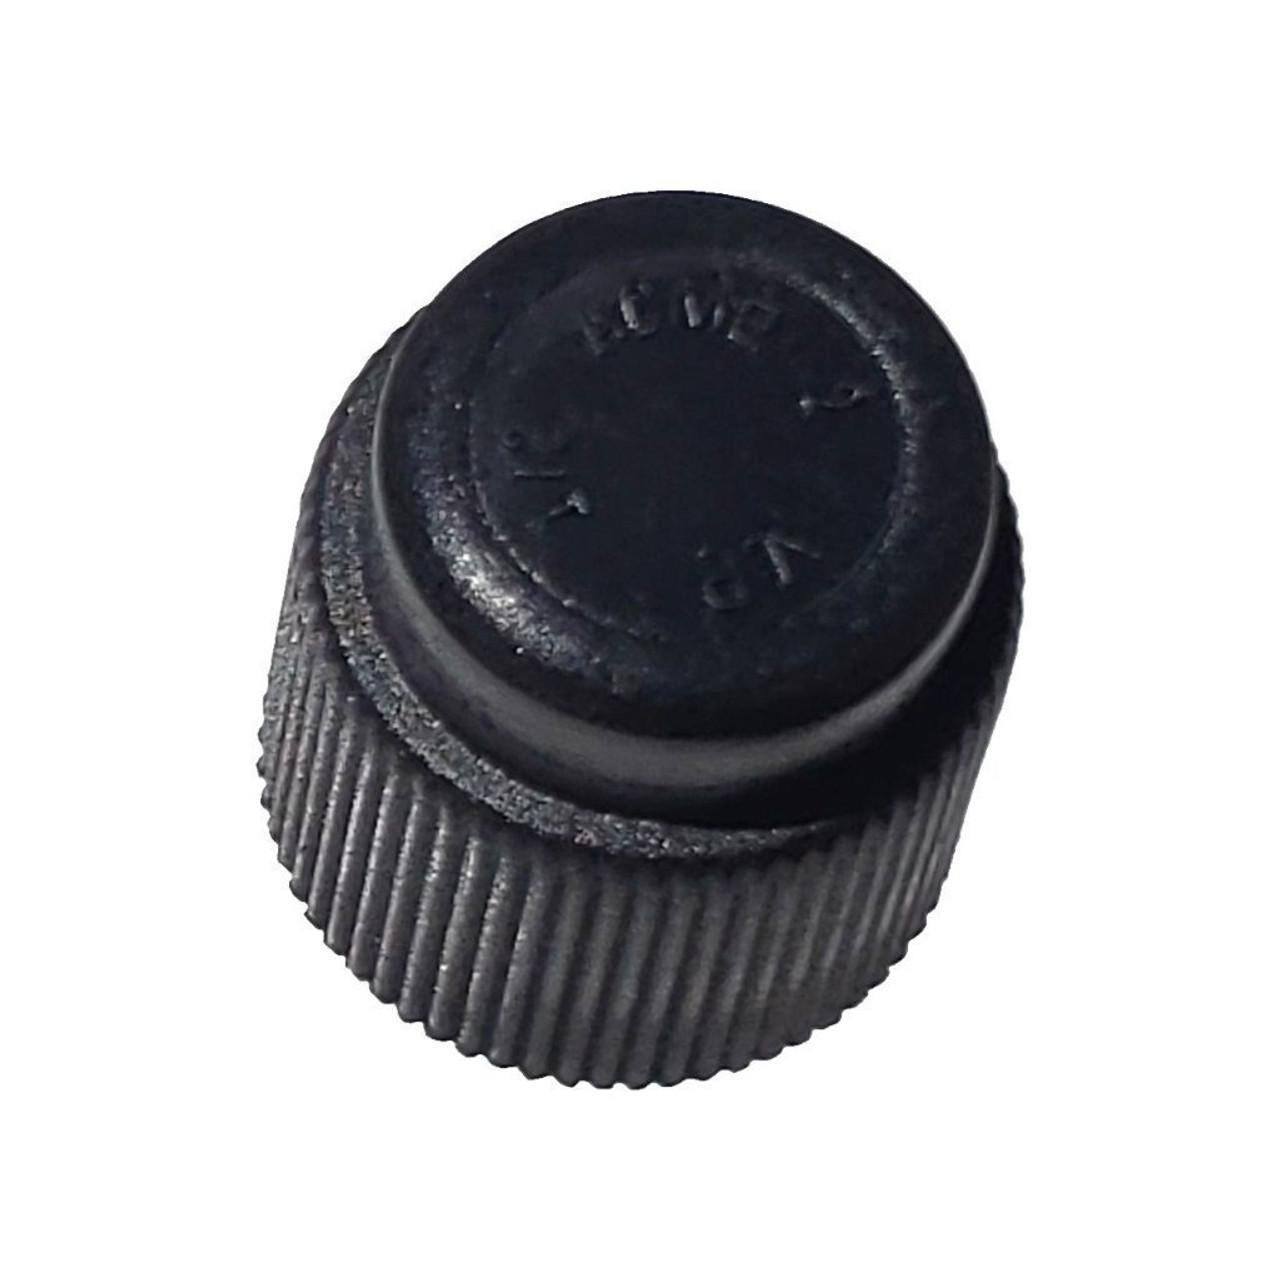 "AC Service Cap - Black ACME 1/2"" - R12"